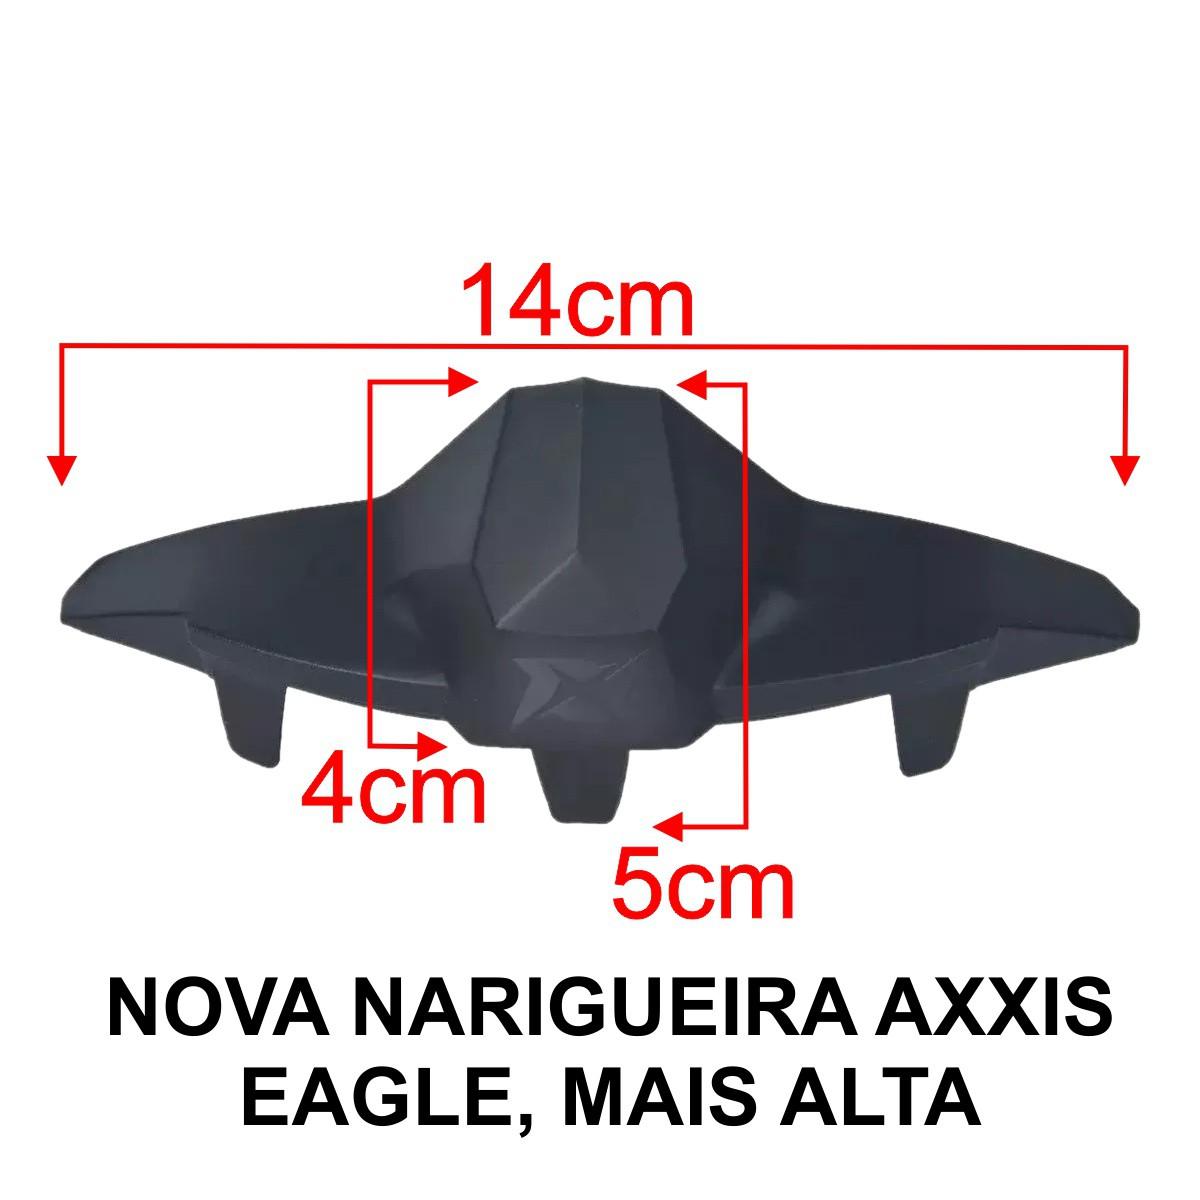 KIT VISEIRA AXXIS EAGLE DOURADA V18 + NARIGUEIRA NEW ALTA